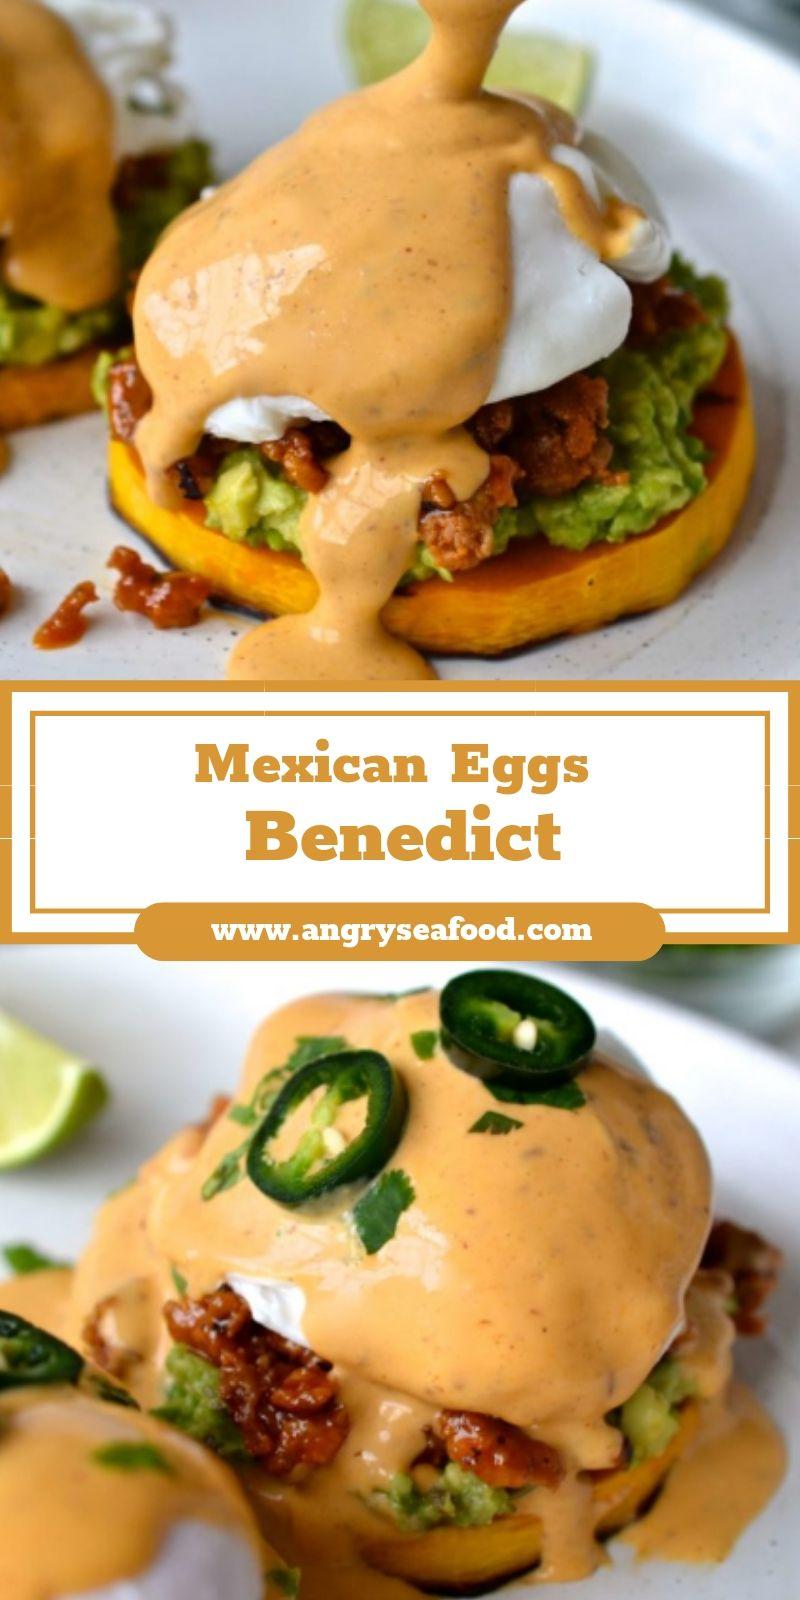 Mexican Eggs Benedict